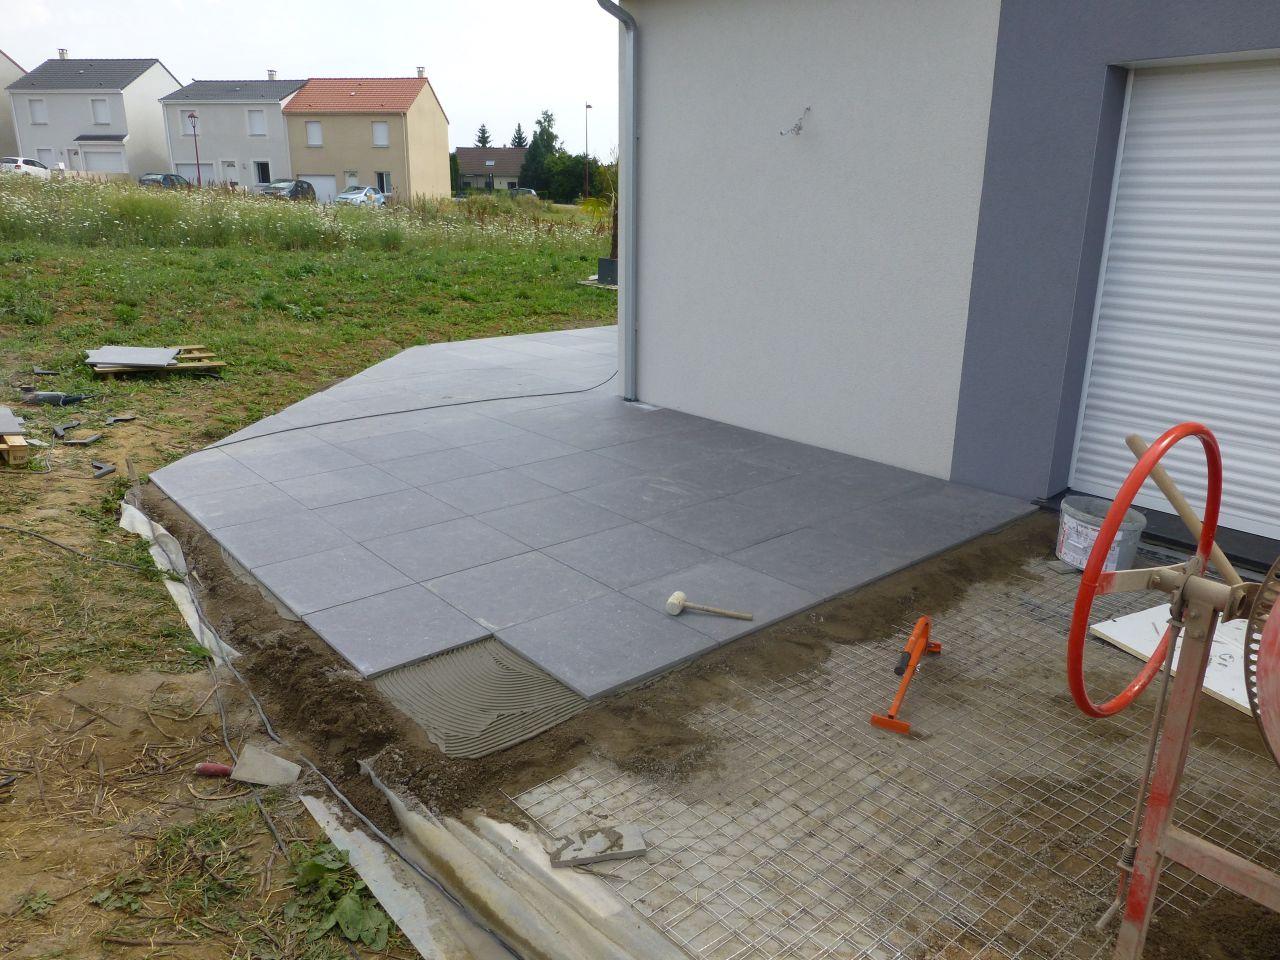 Carrelage ep 2 cm pour terrasse solution id al 63 for Carrelage glissant solution